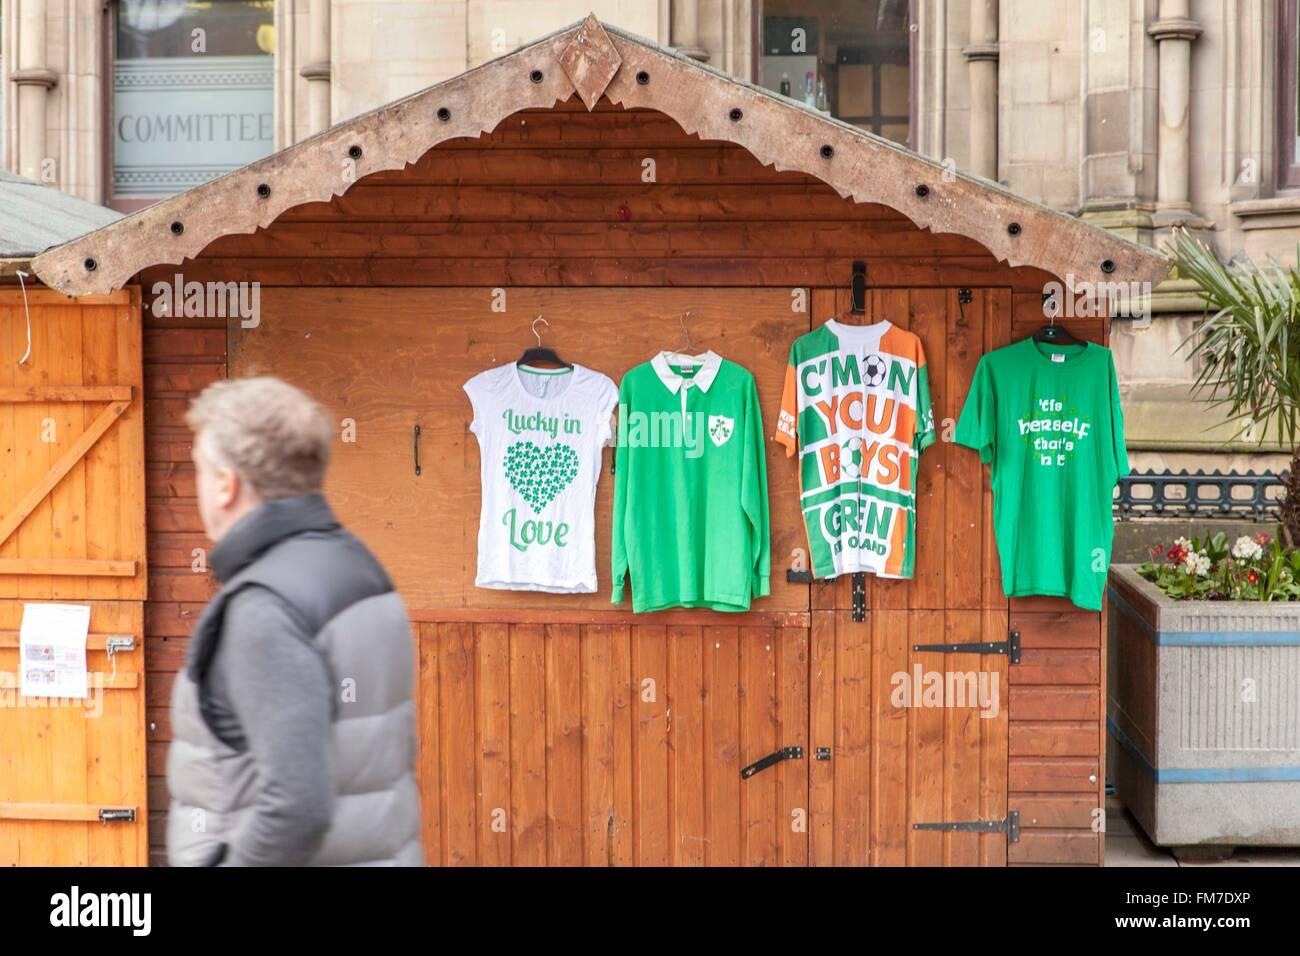 Manchester, Albert Square, 10th March, 2016. Irish memorabilia adorns a hut, as onlookers peruse the stall Credit: - Stock Image